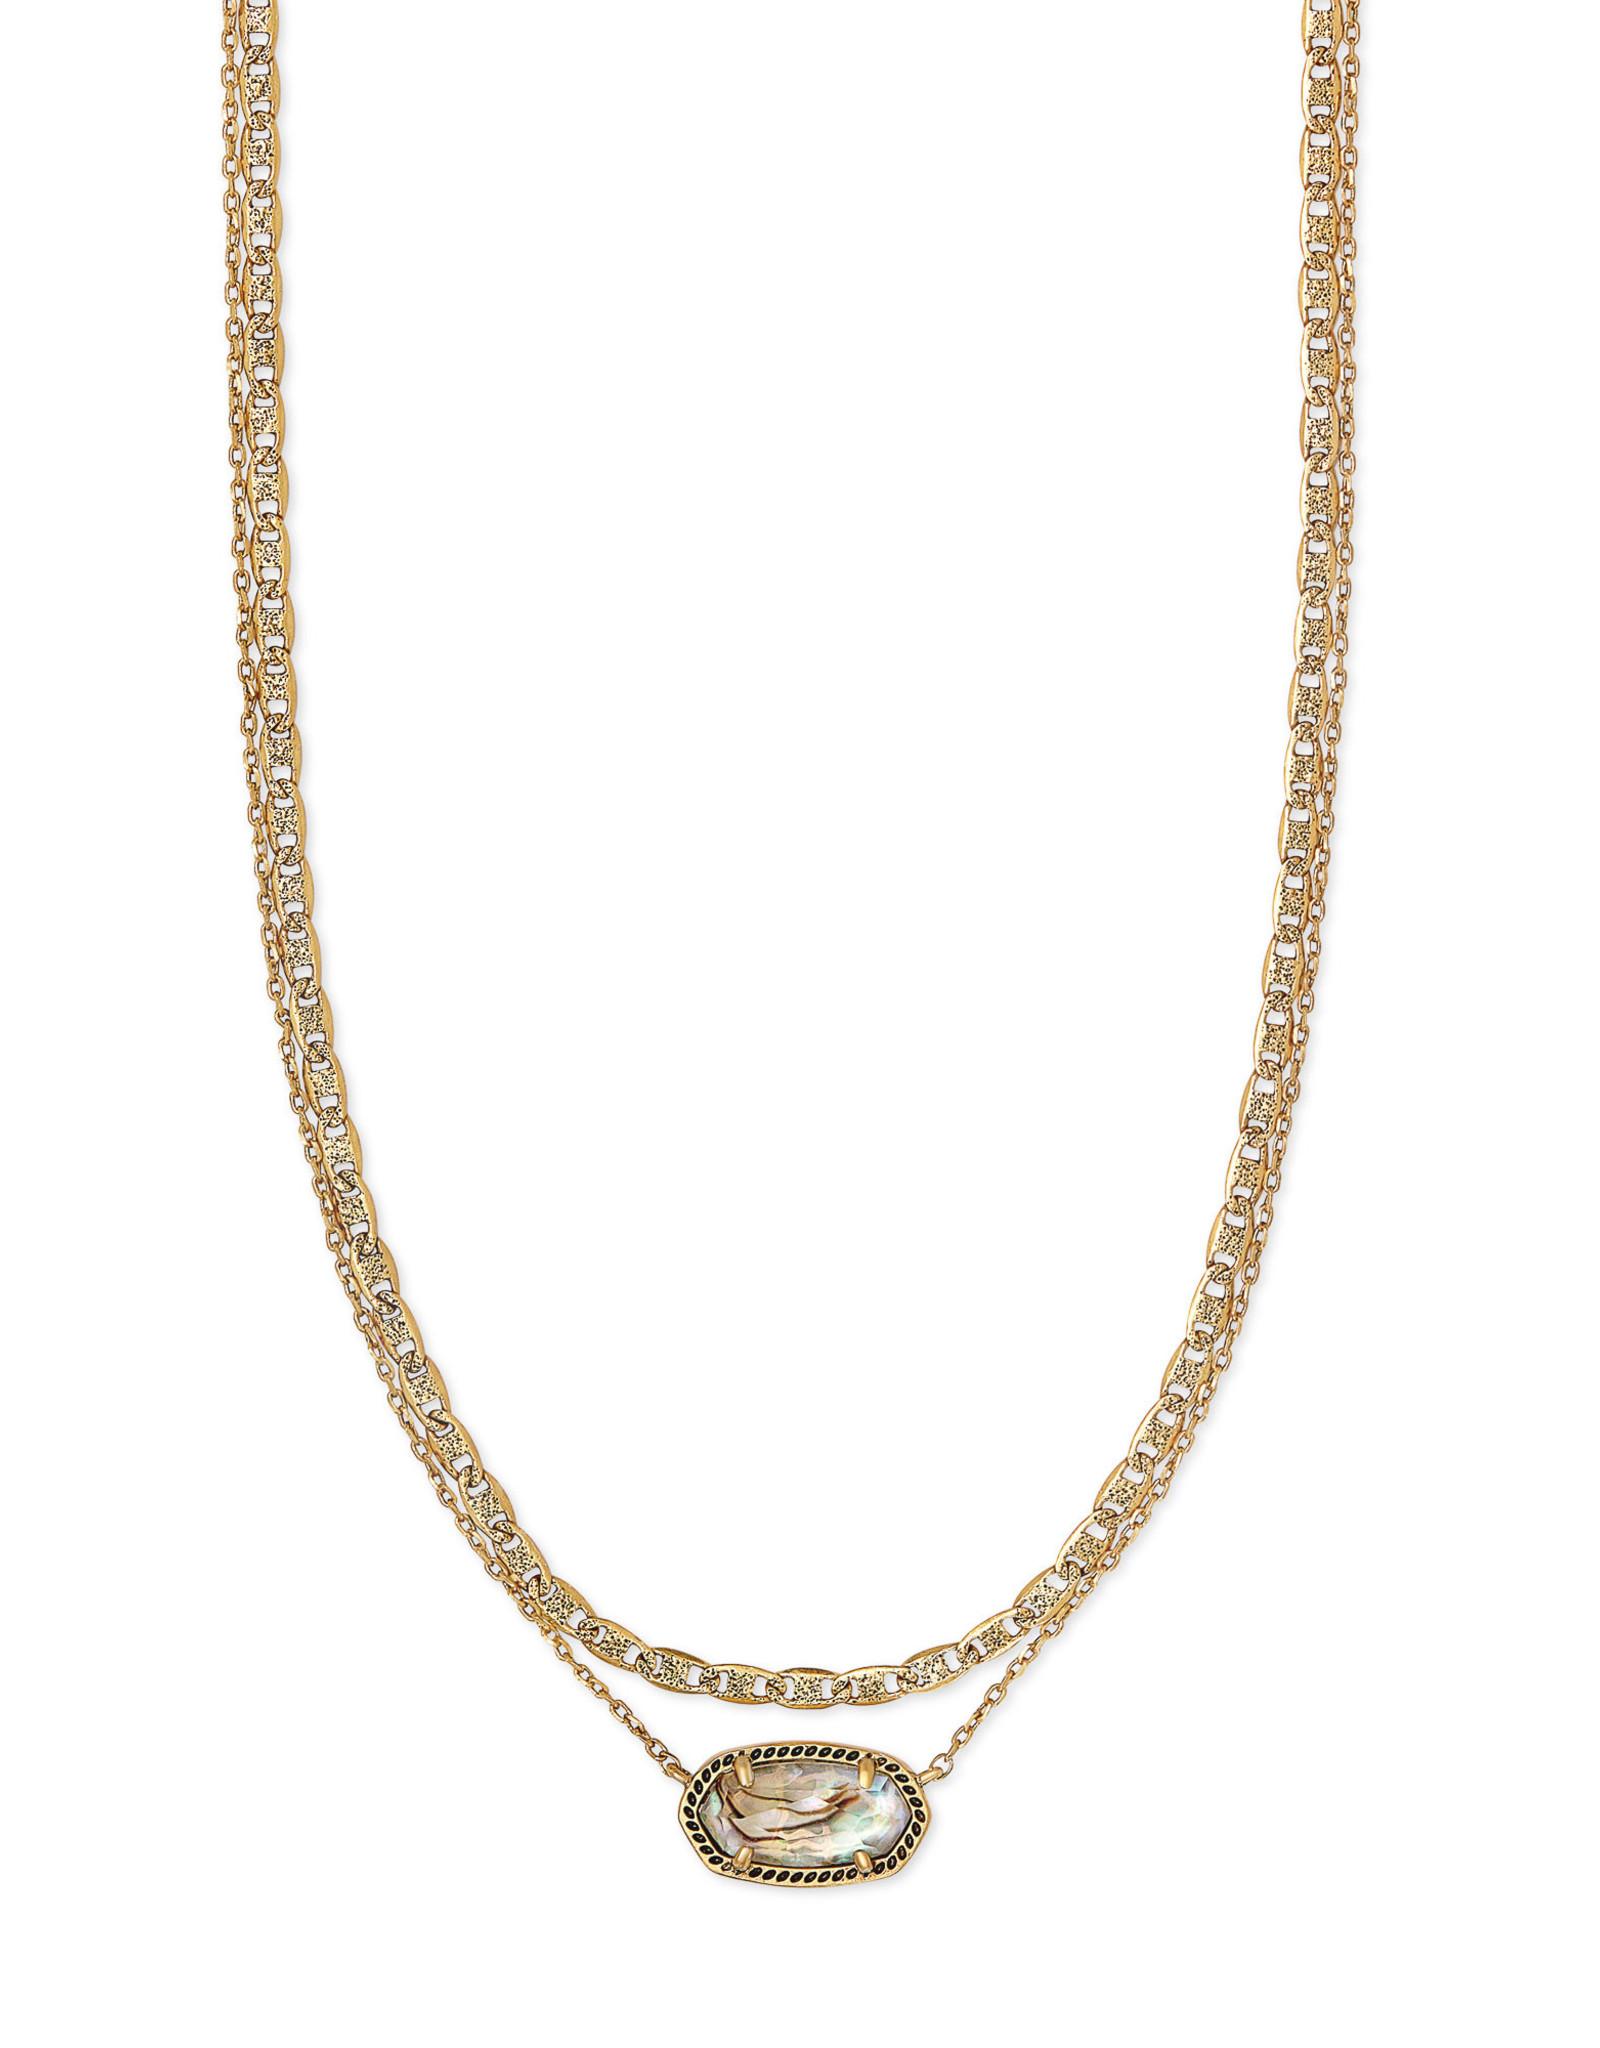 Kendra Scott Elisa Multi Strand Necklace - White Abalone/Vintage Gold